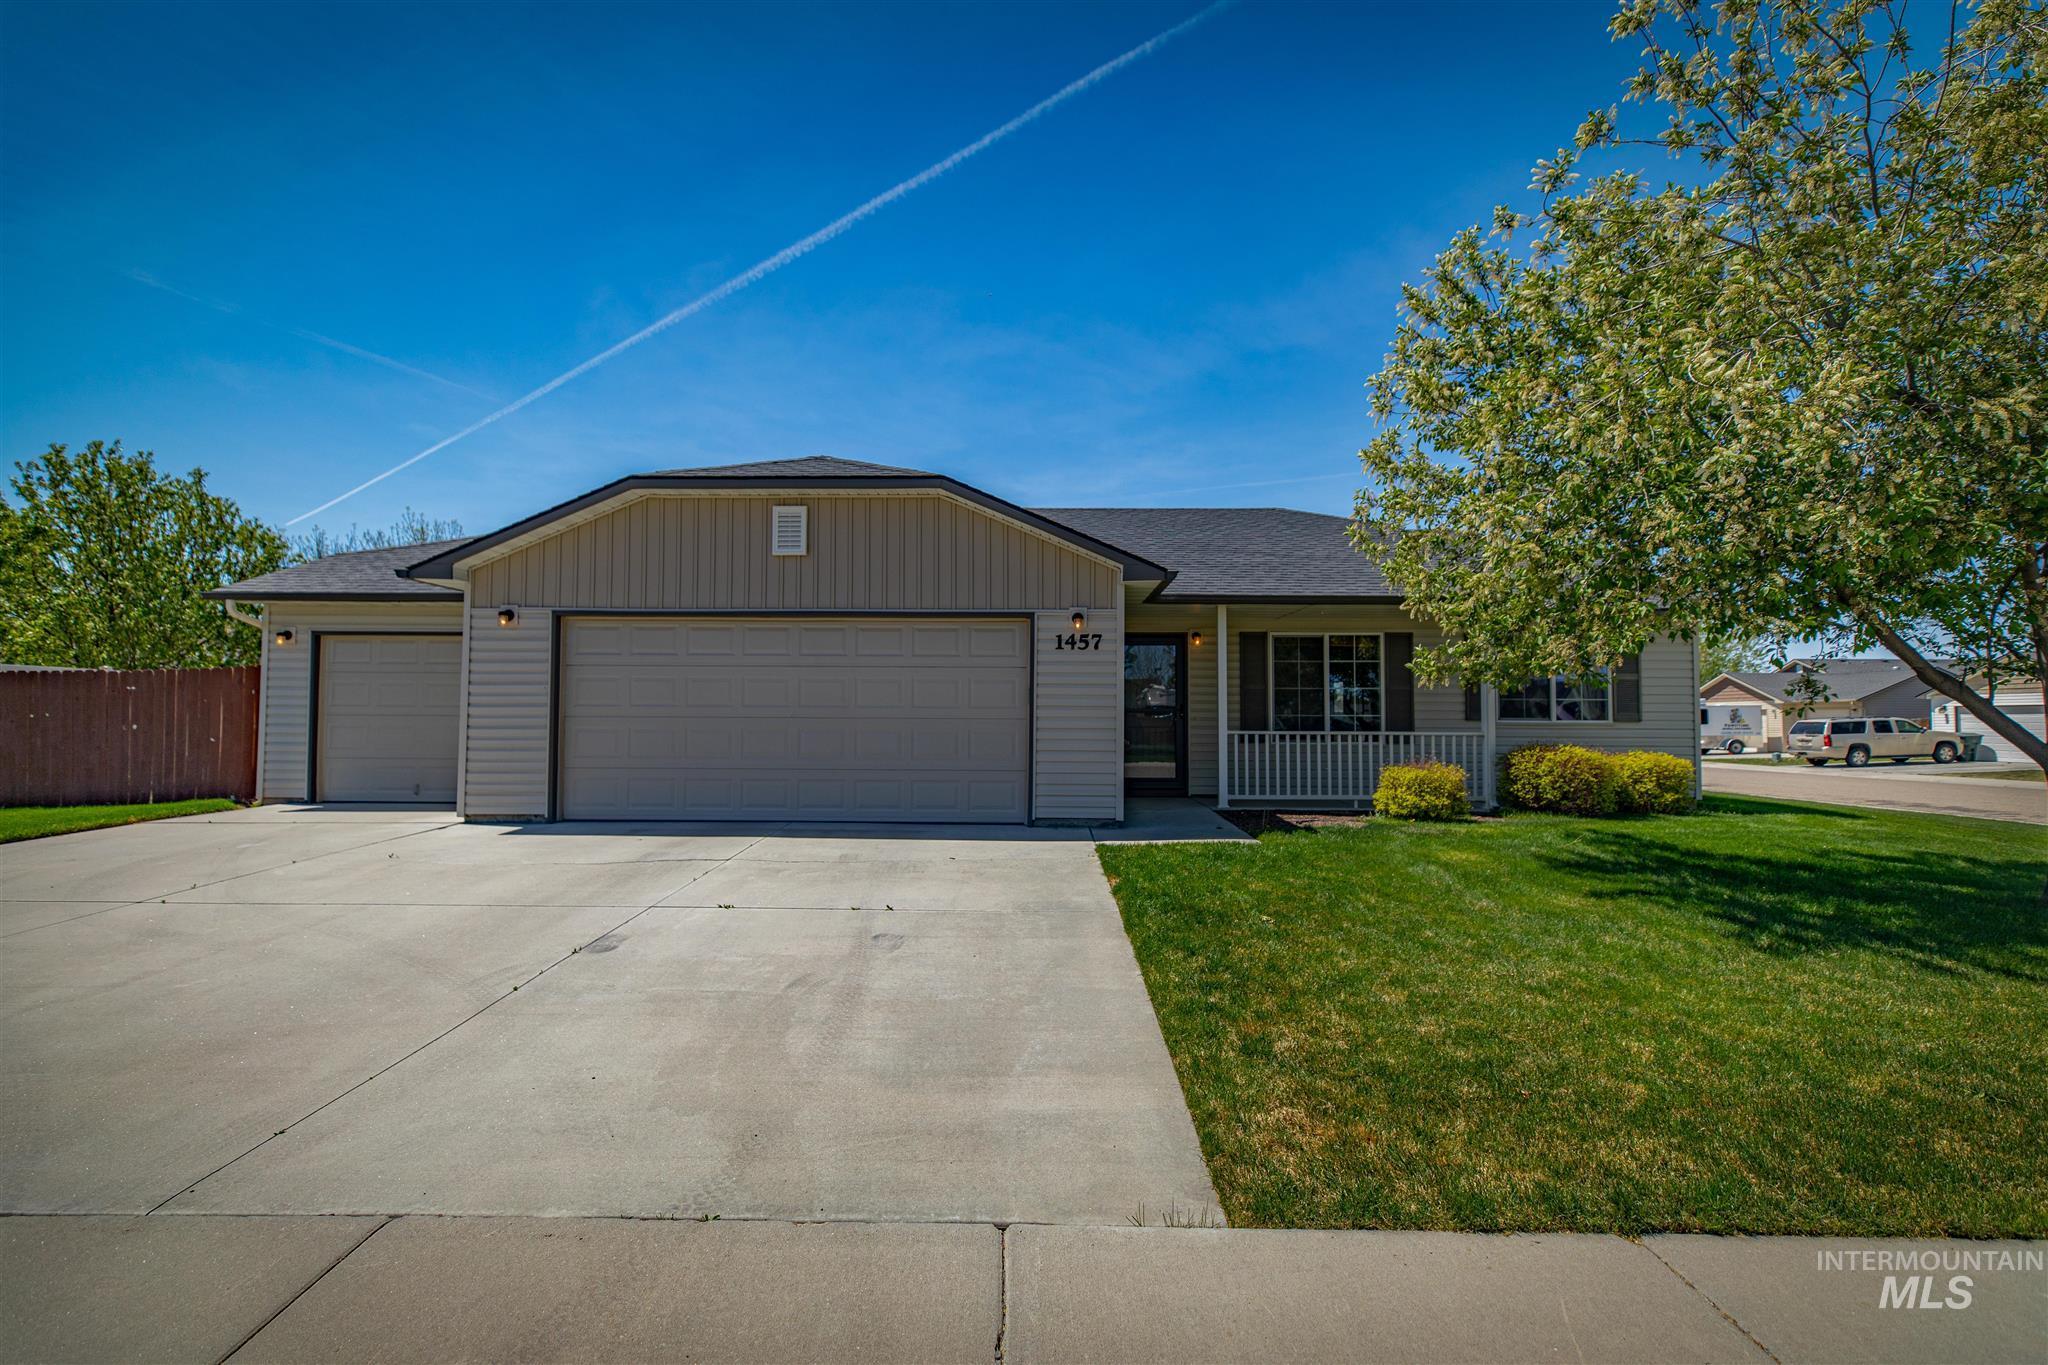 1457 S Woodmaste Property Photo - Kuna, ID real estate listing